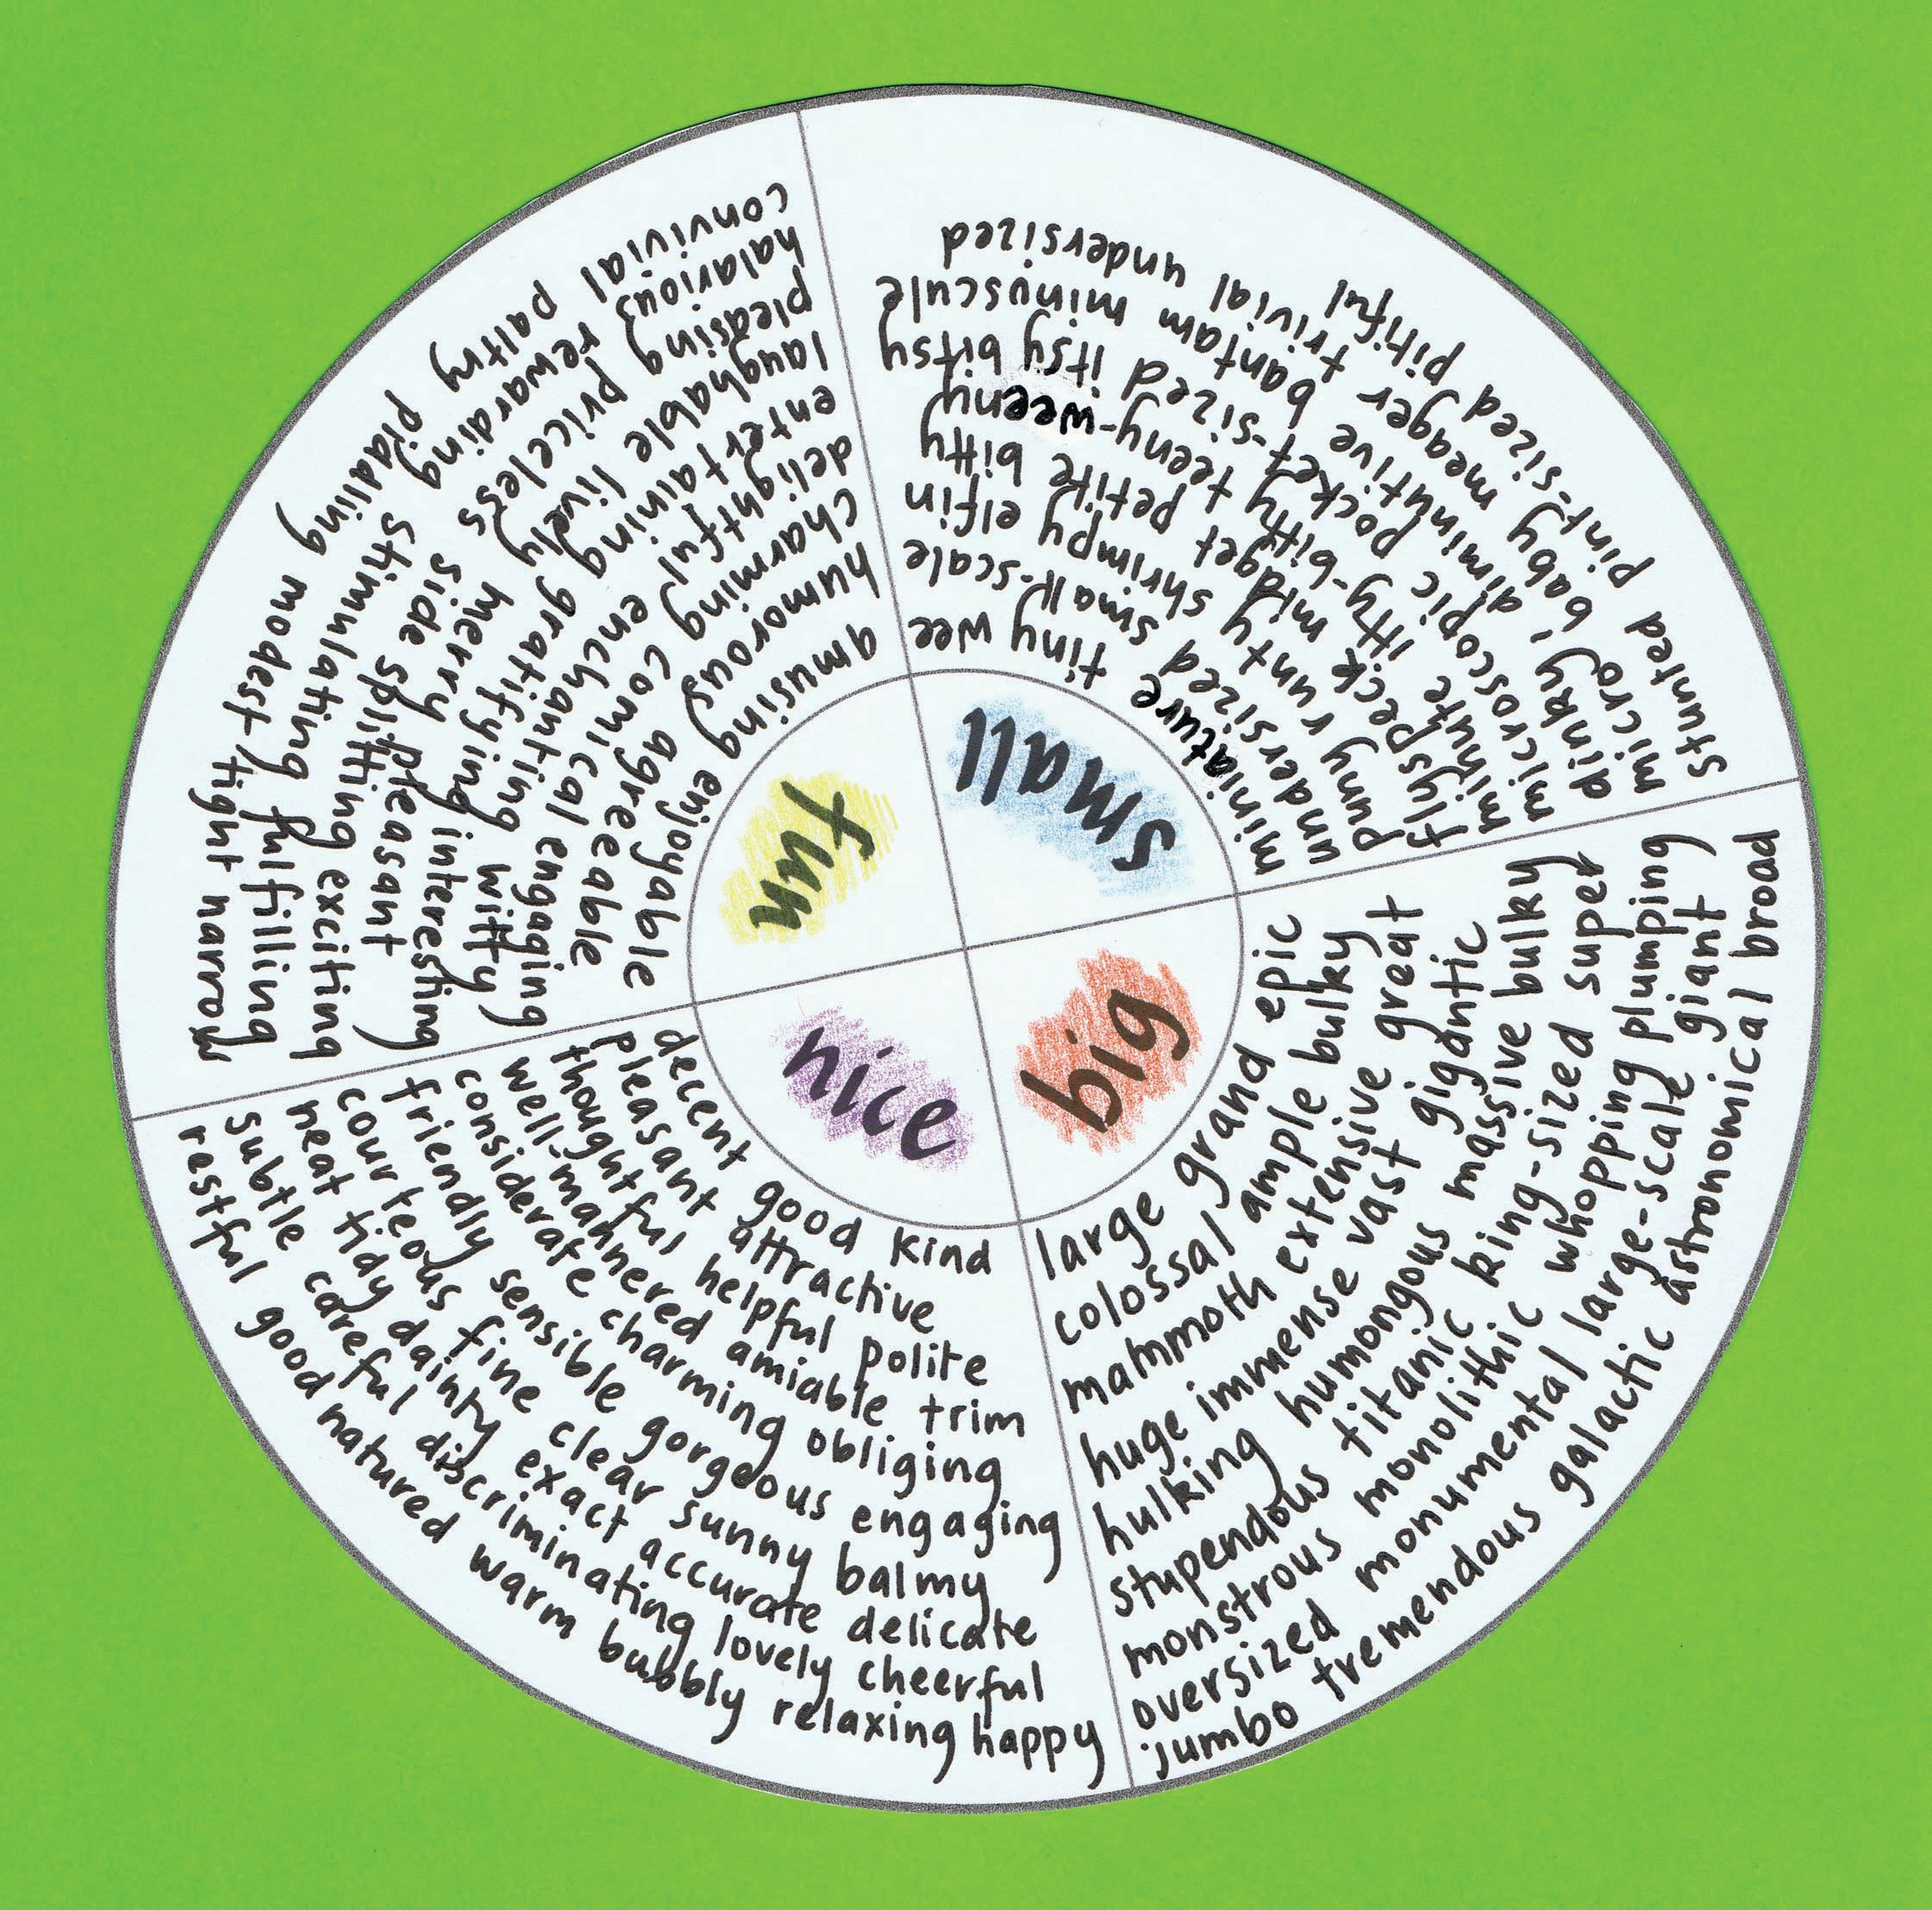 http://cdn.shopify.com/s/files/1/0239/9539/files/word-wheel.jpg ...